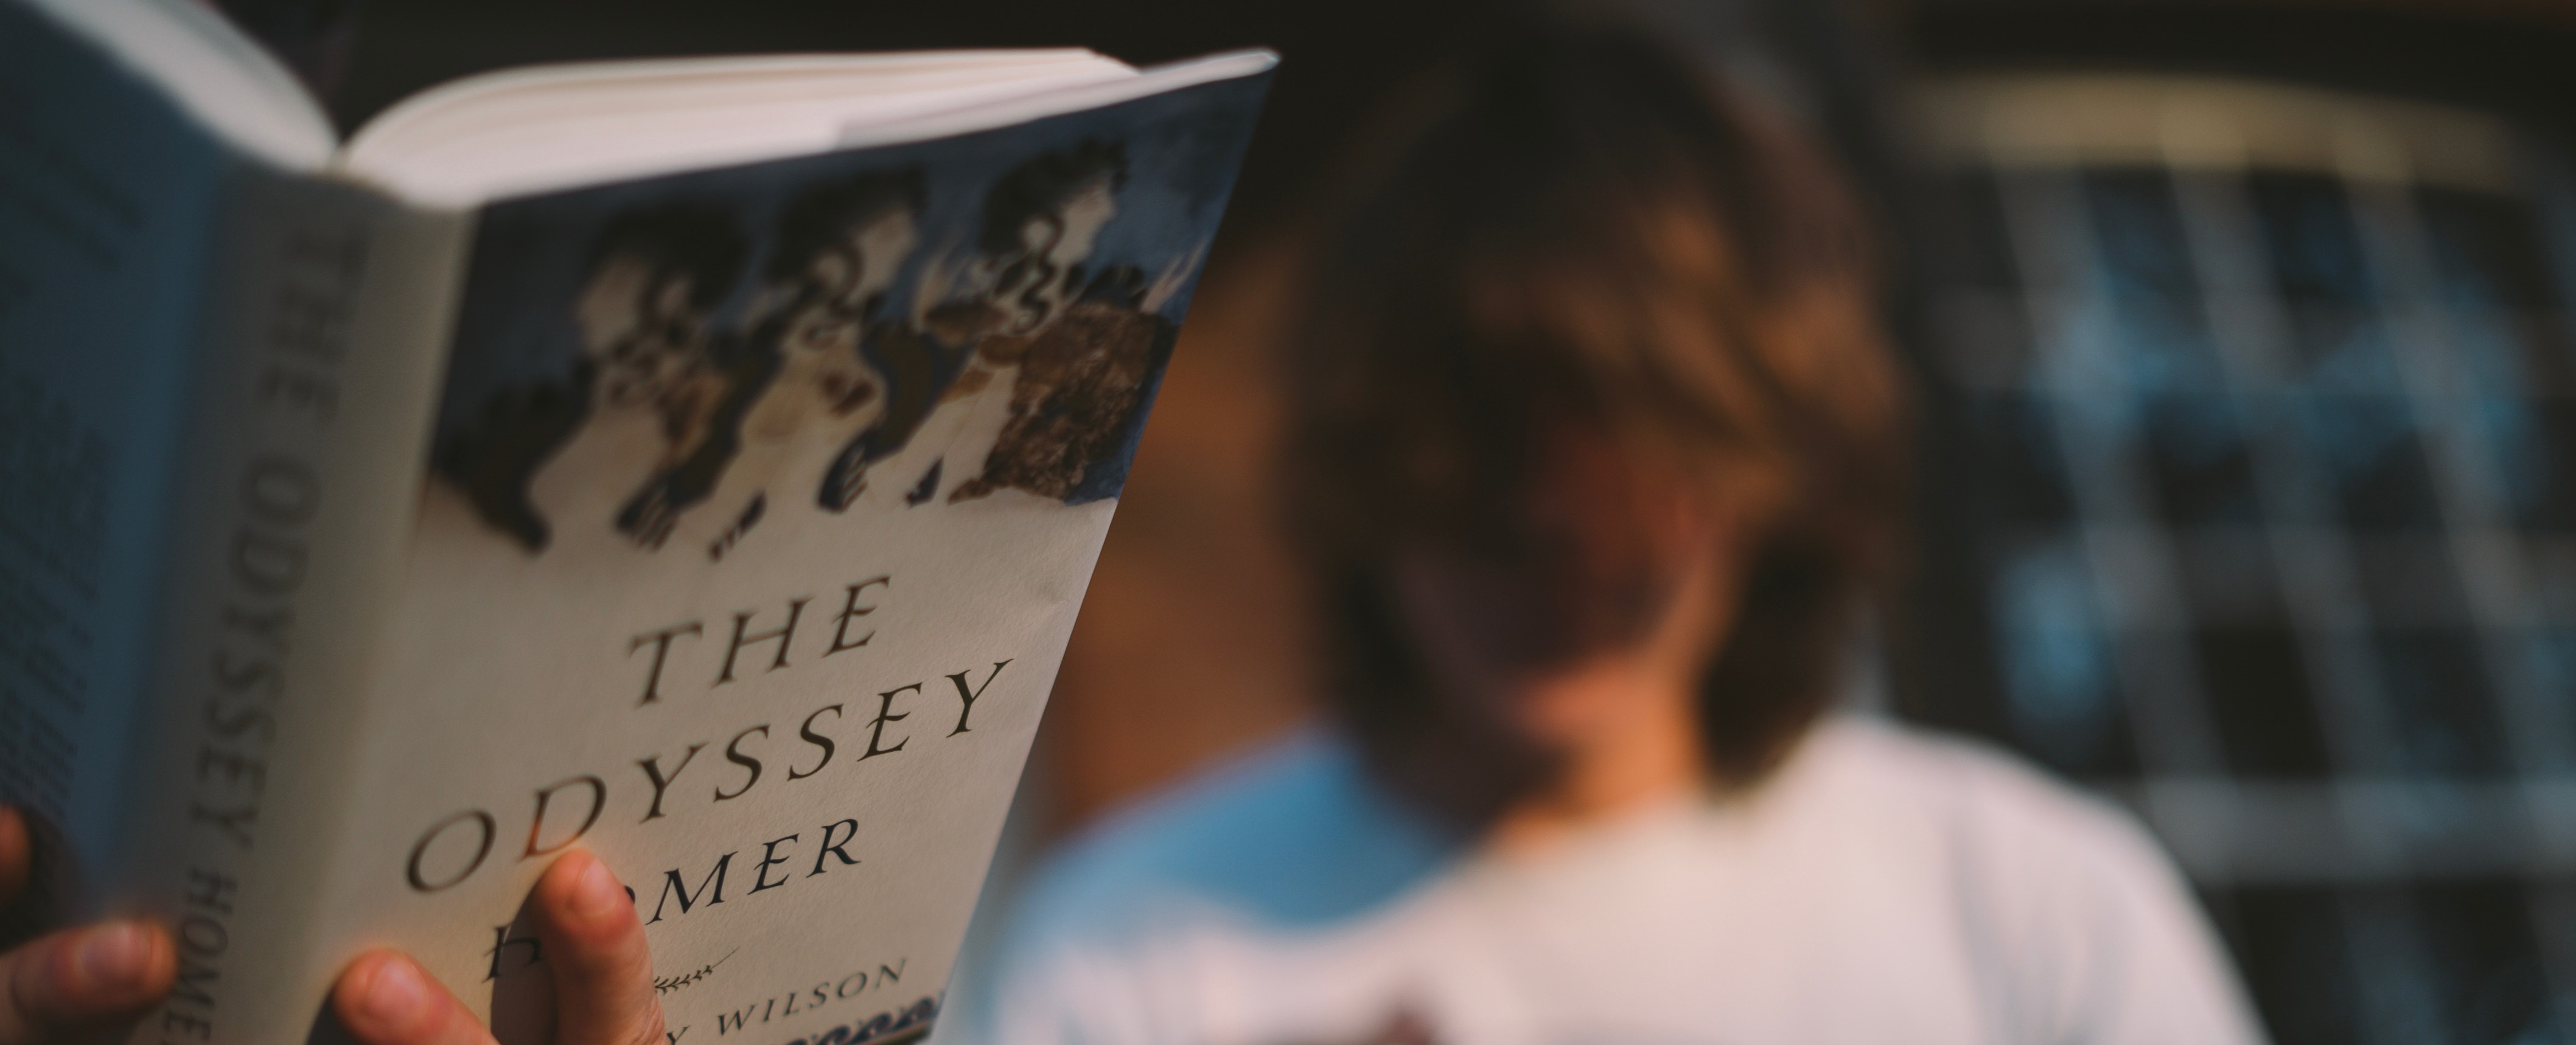 the odyssey banner - tbel-abuseridze-662841-unsplash